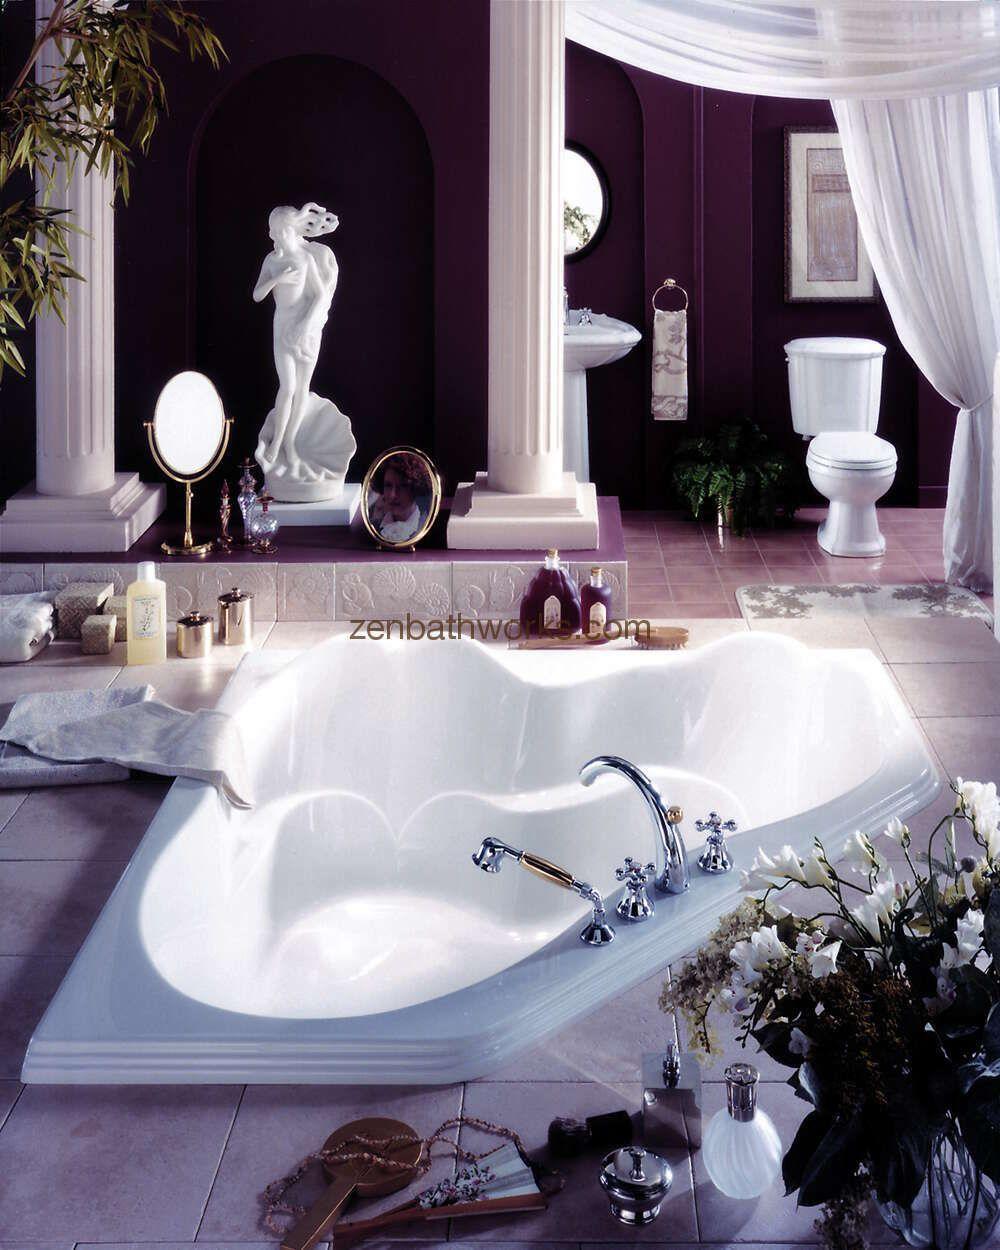 Zen Bathworks - Ariane Corner Bathtub by Neptune, $999.00 (http://www.zenbathworks.com/ariane/)